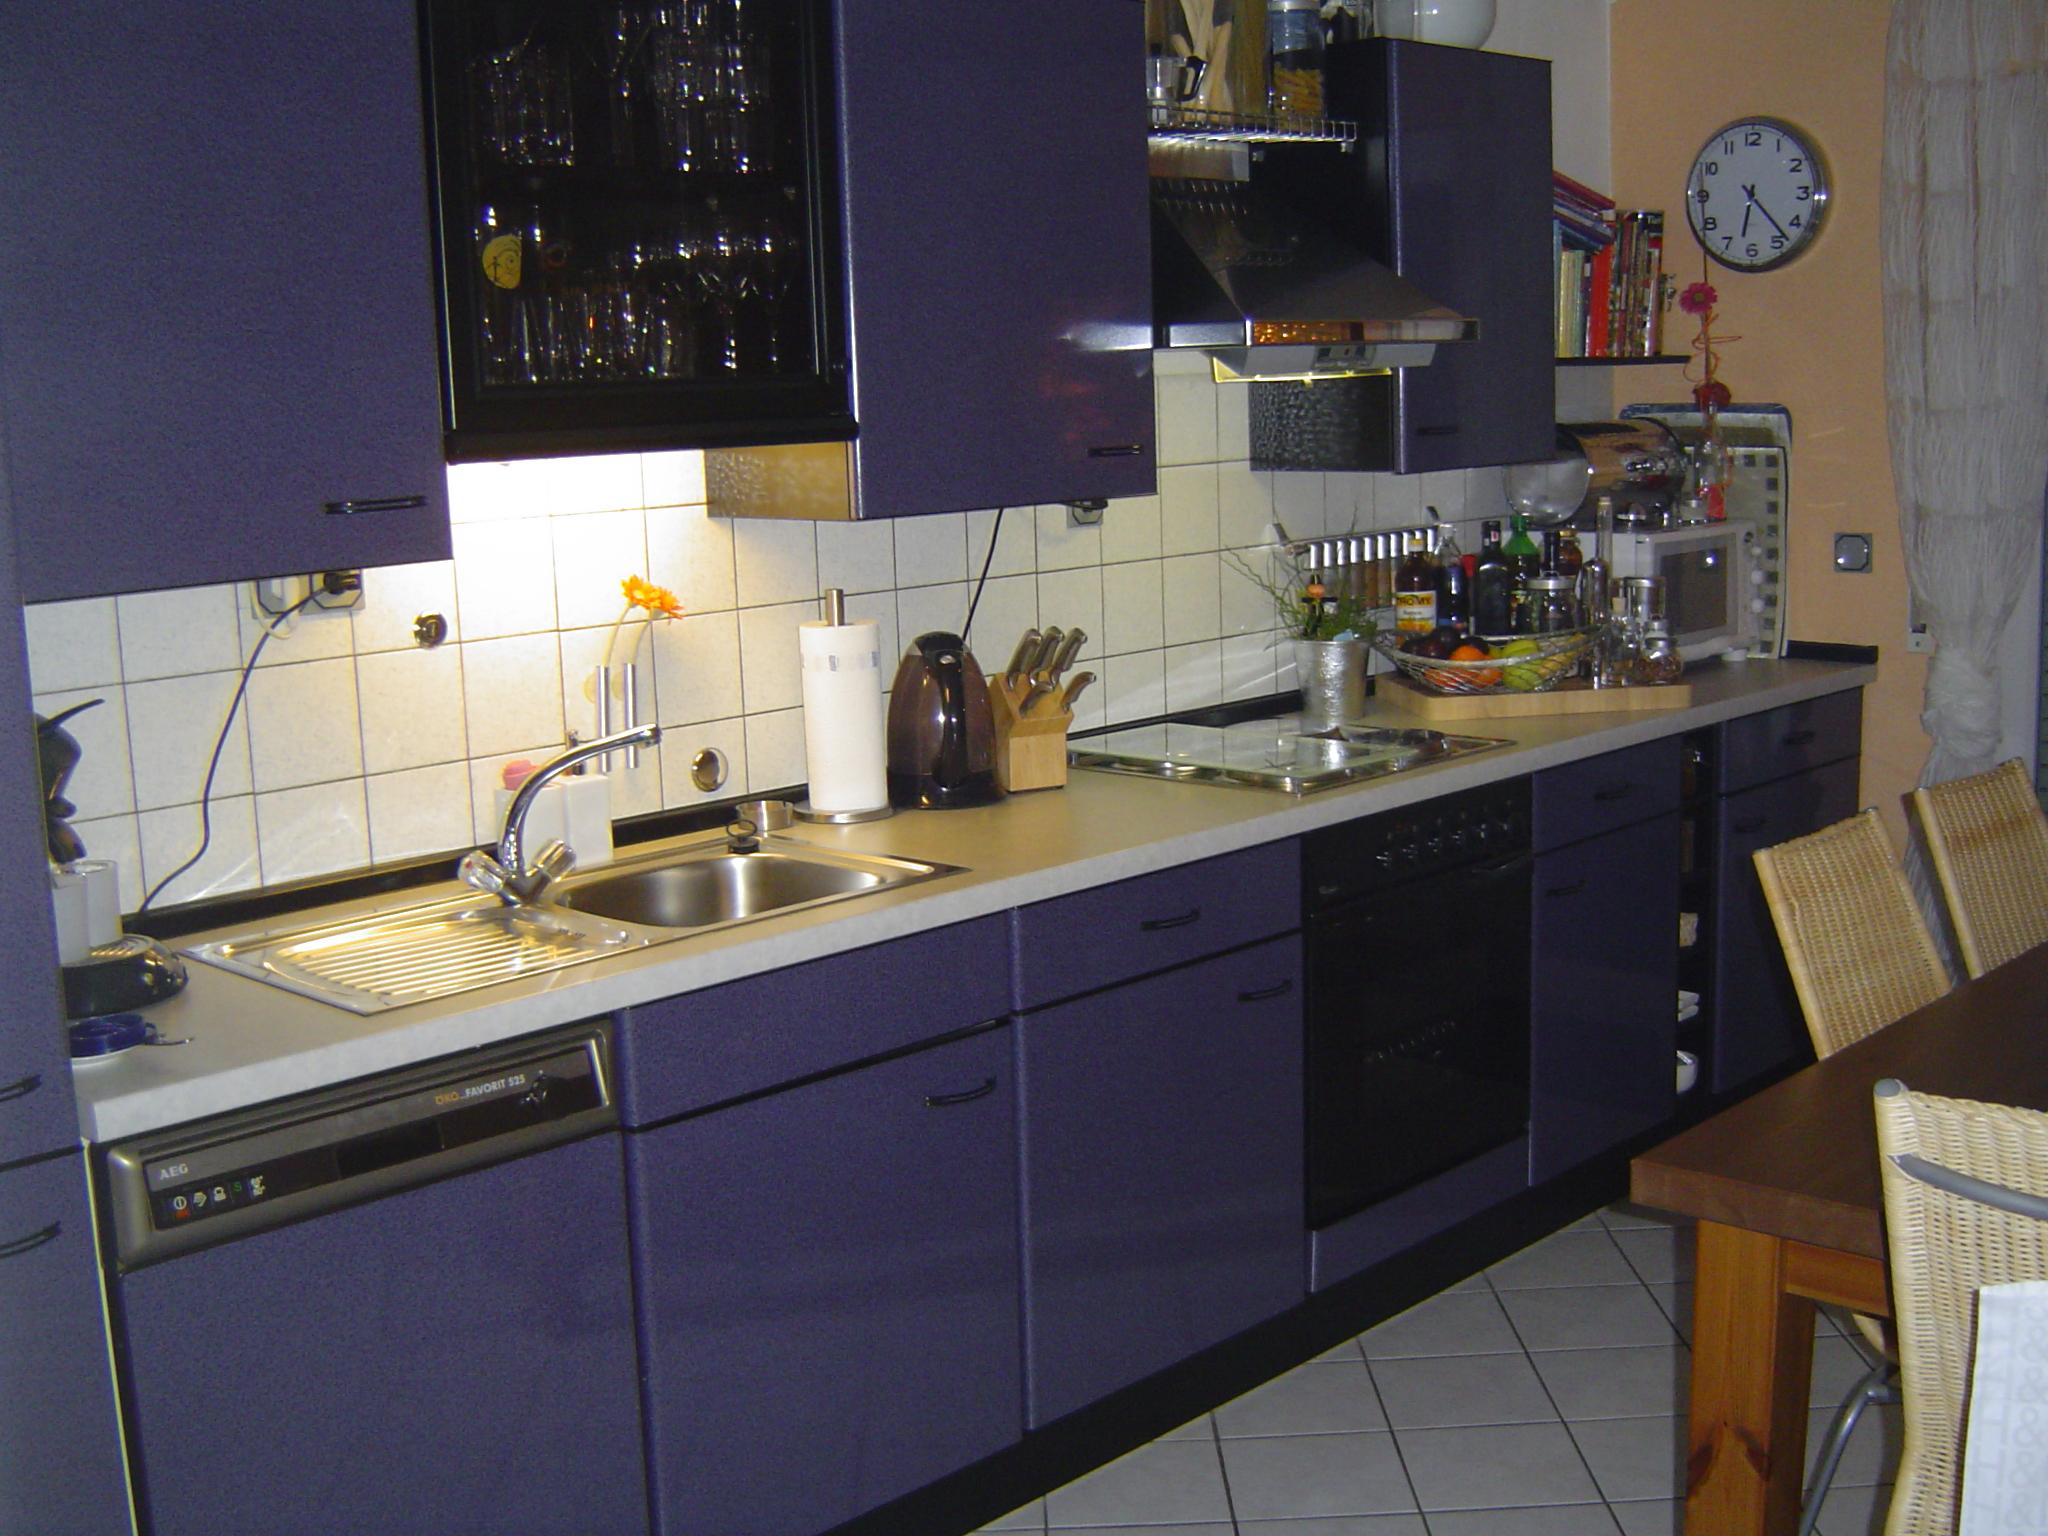 Folie Für Küche | dockarm.com